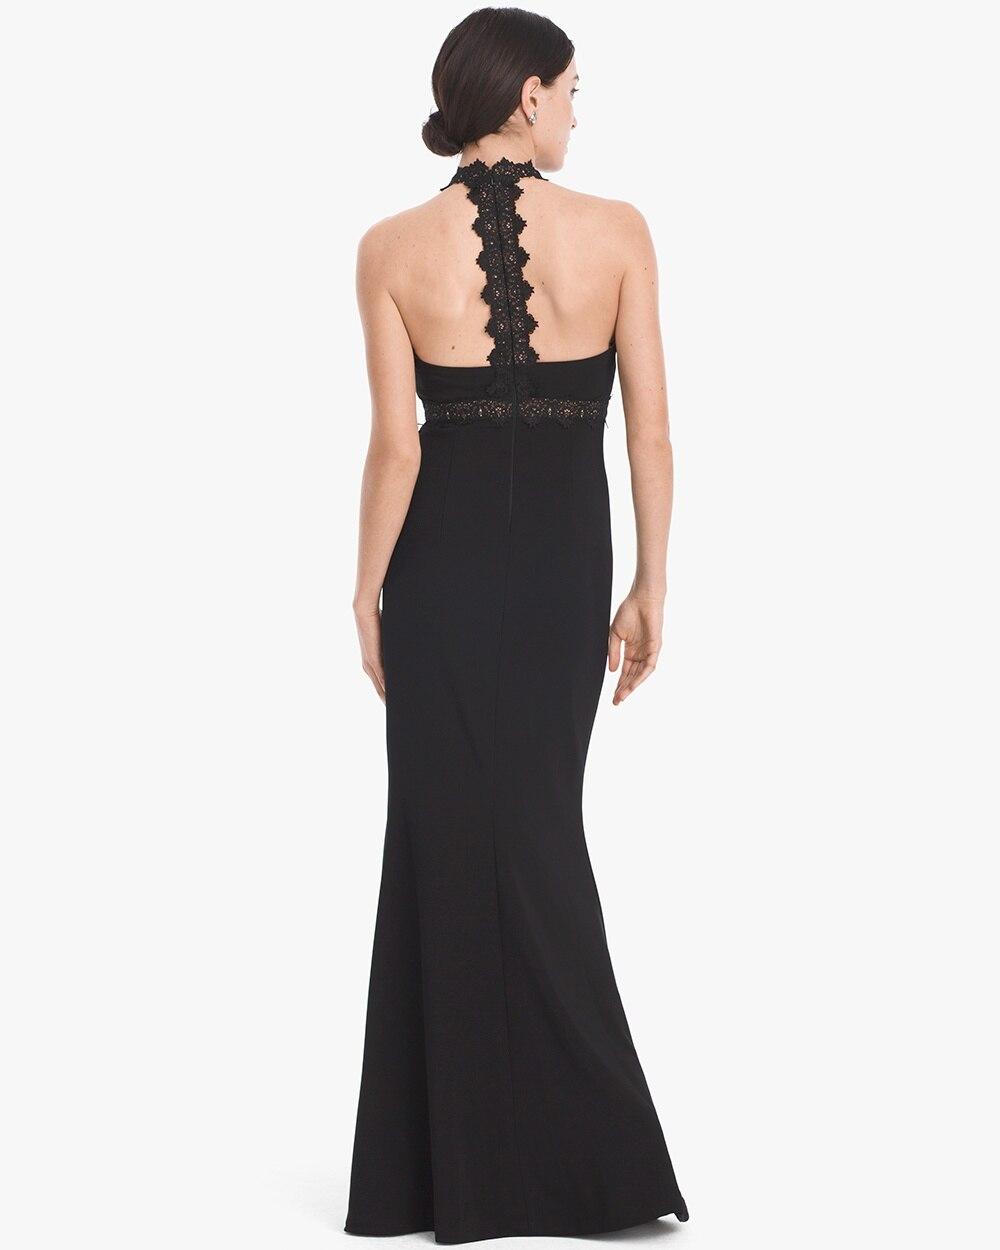 Black Lace Inset T-Back Gown - White House Black Market